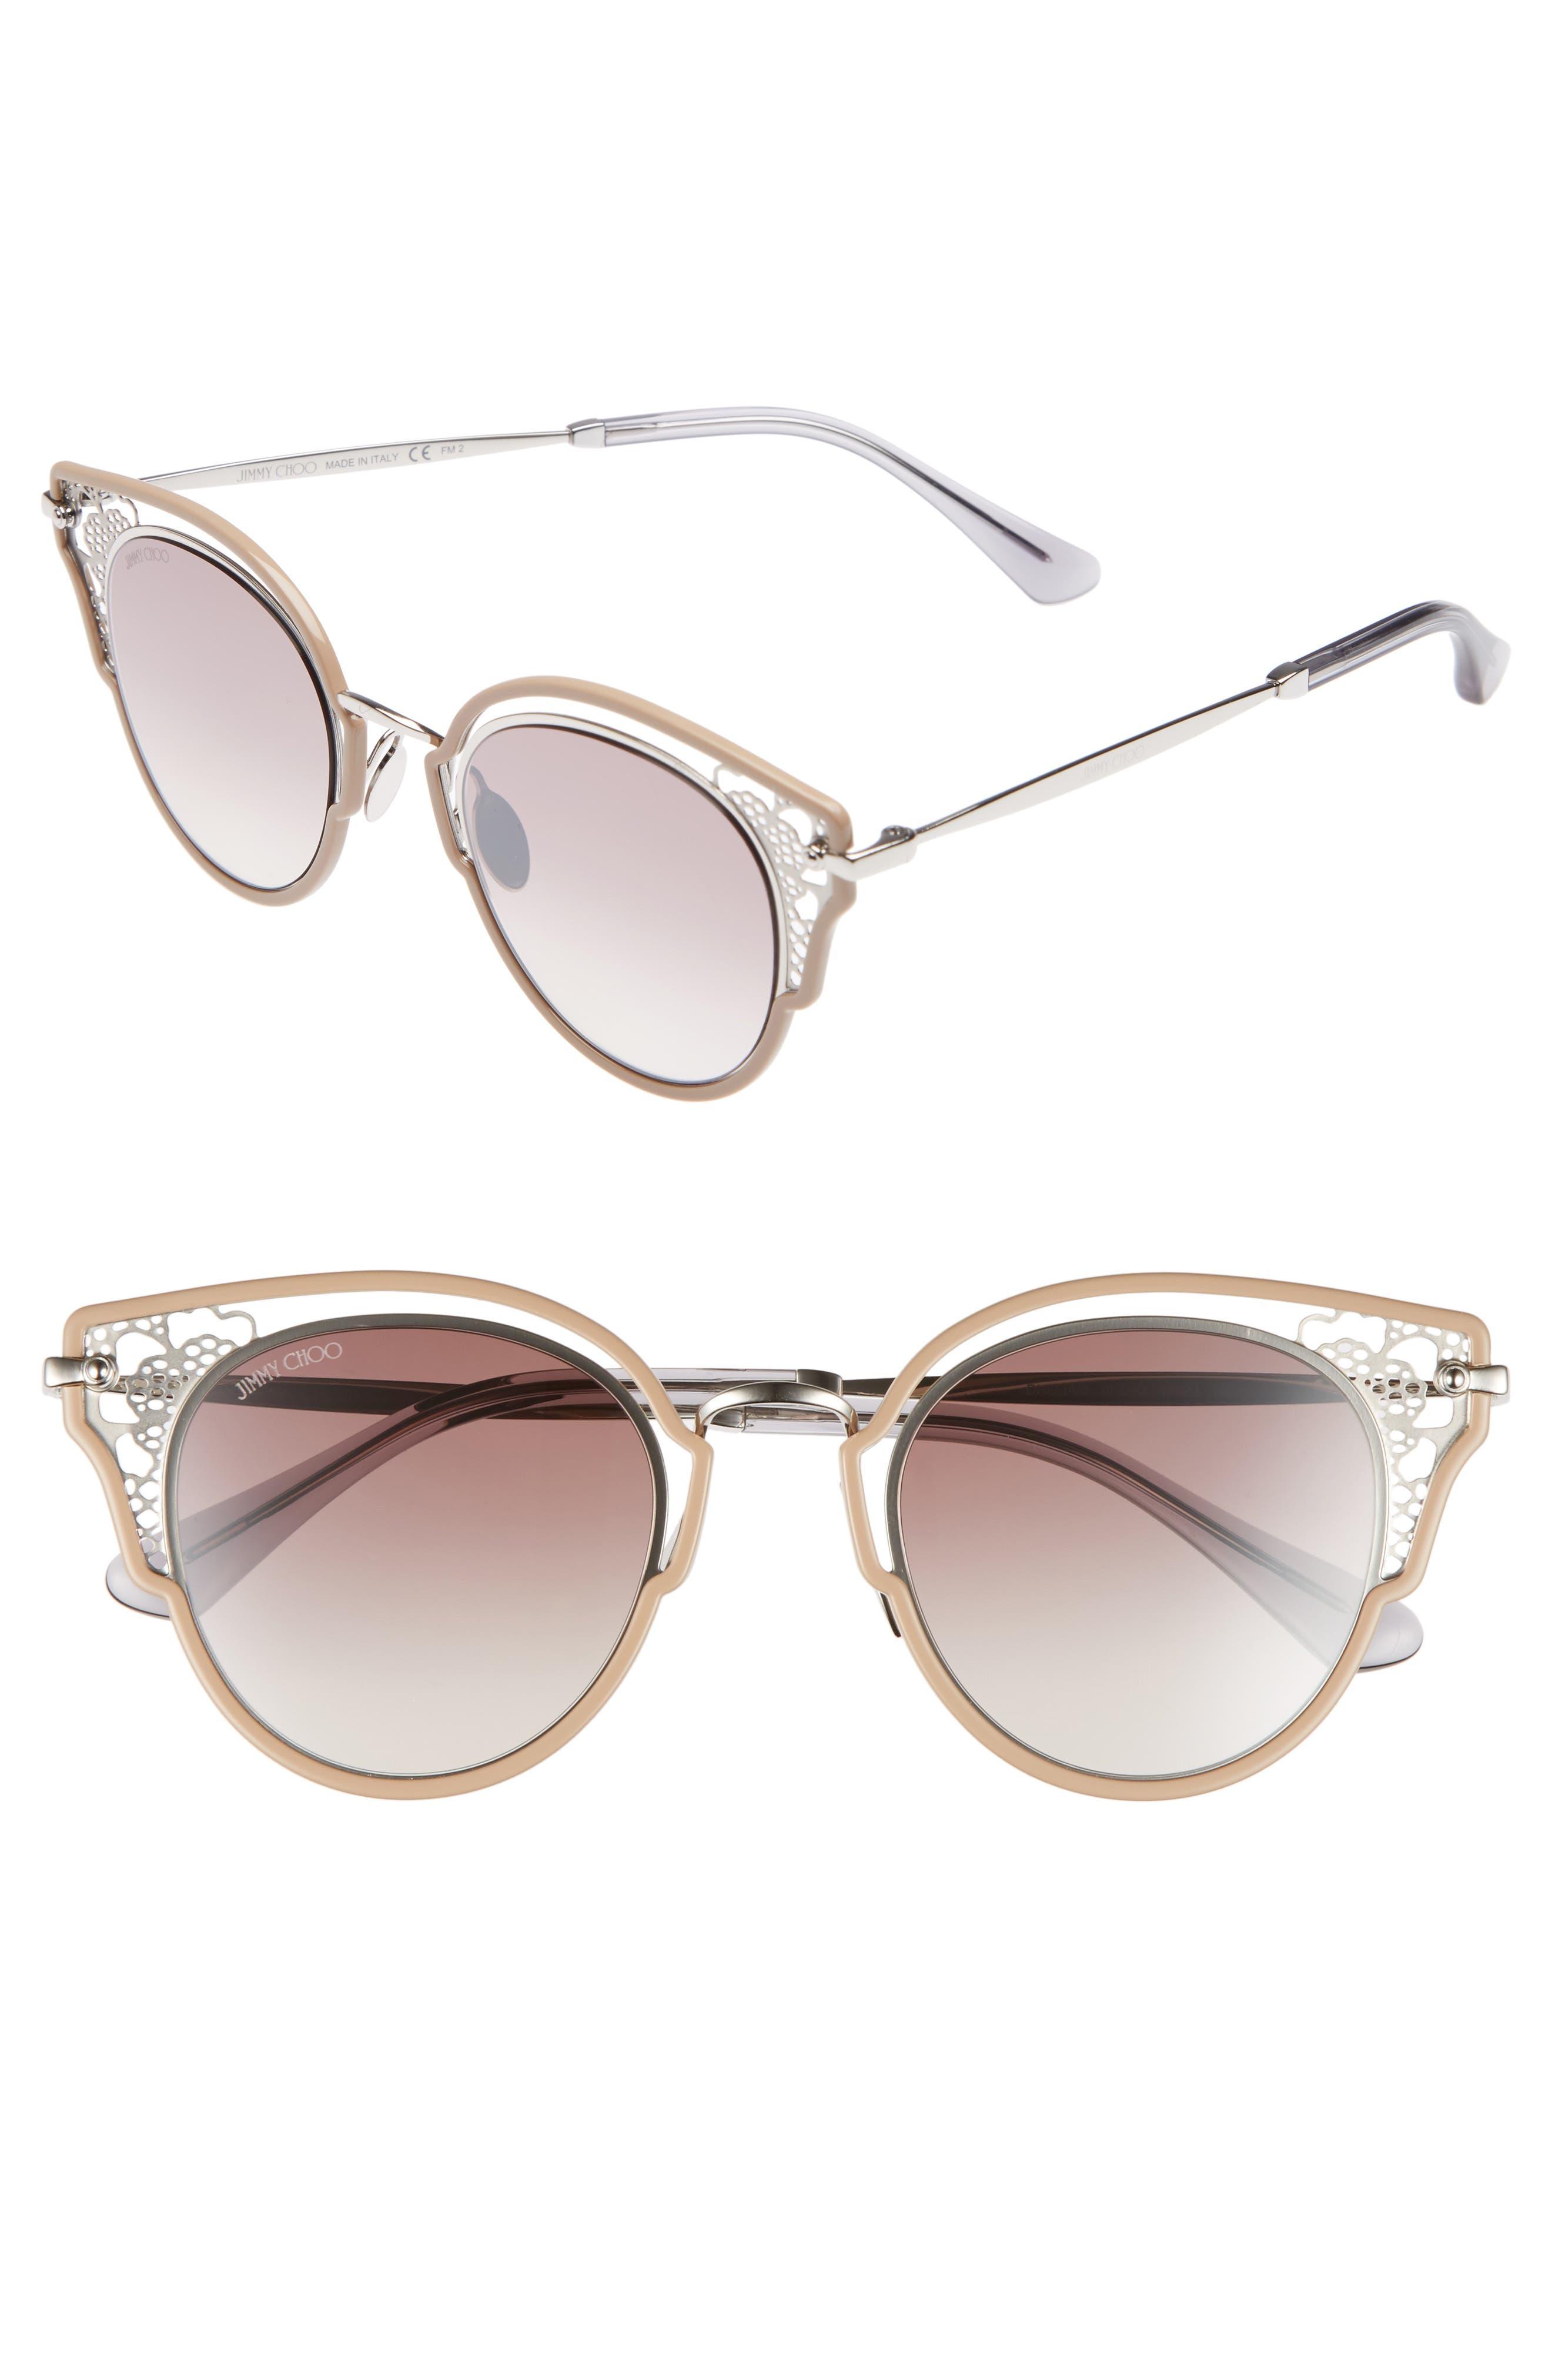 Dhelias 48mm Cat Eye Sunglasses,                         Main,                         color, Nude Palladium